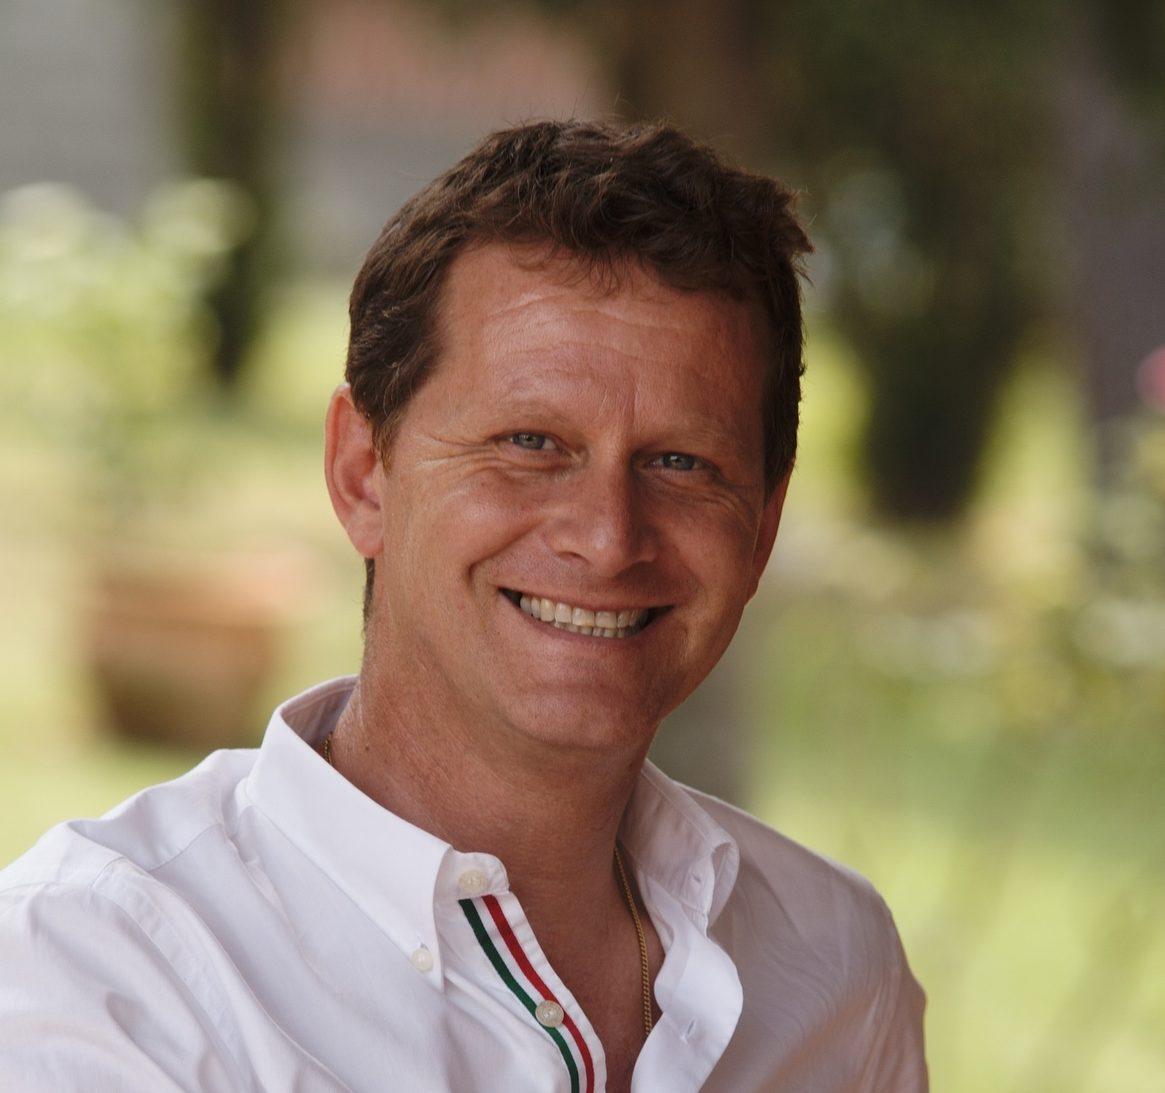 Salvatore Moccia